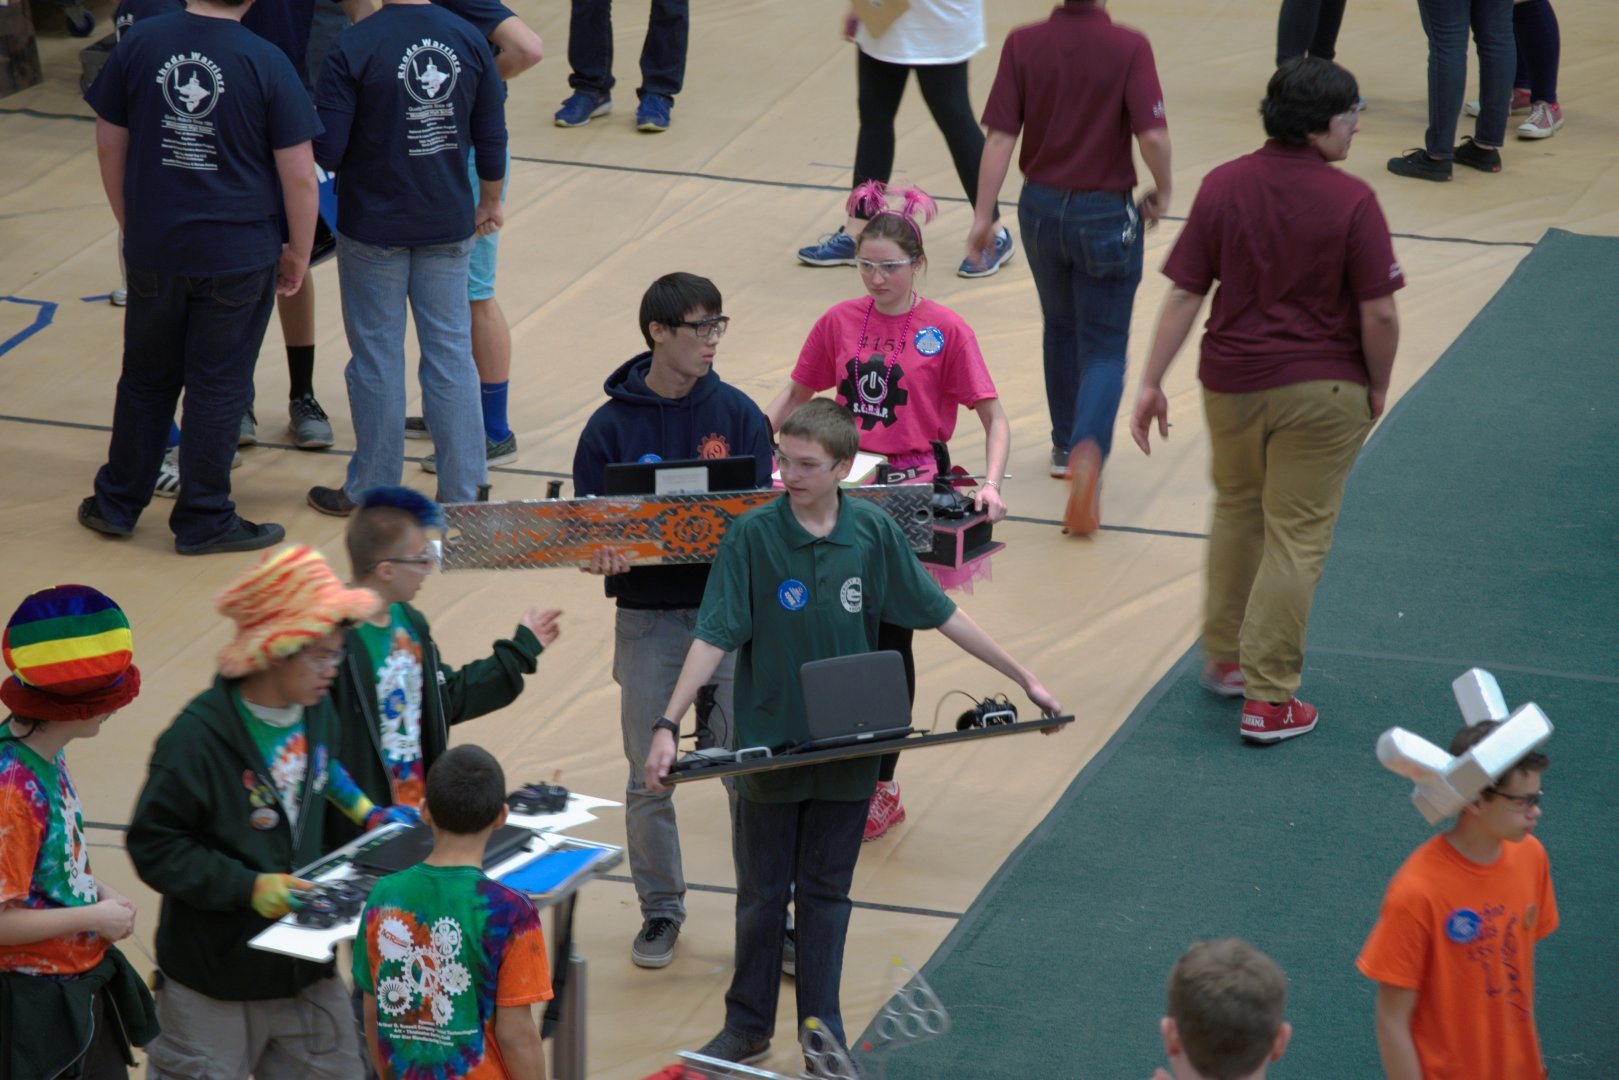 155-FIRST-Robotics-Competition-Umass-Dartmouth-March-18-20.2016-